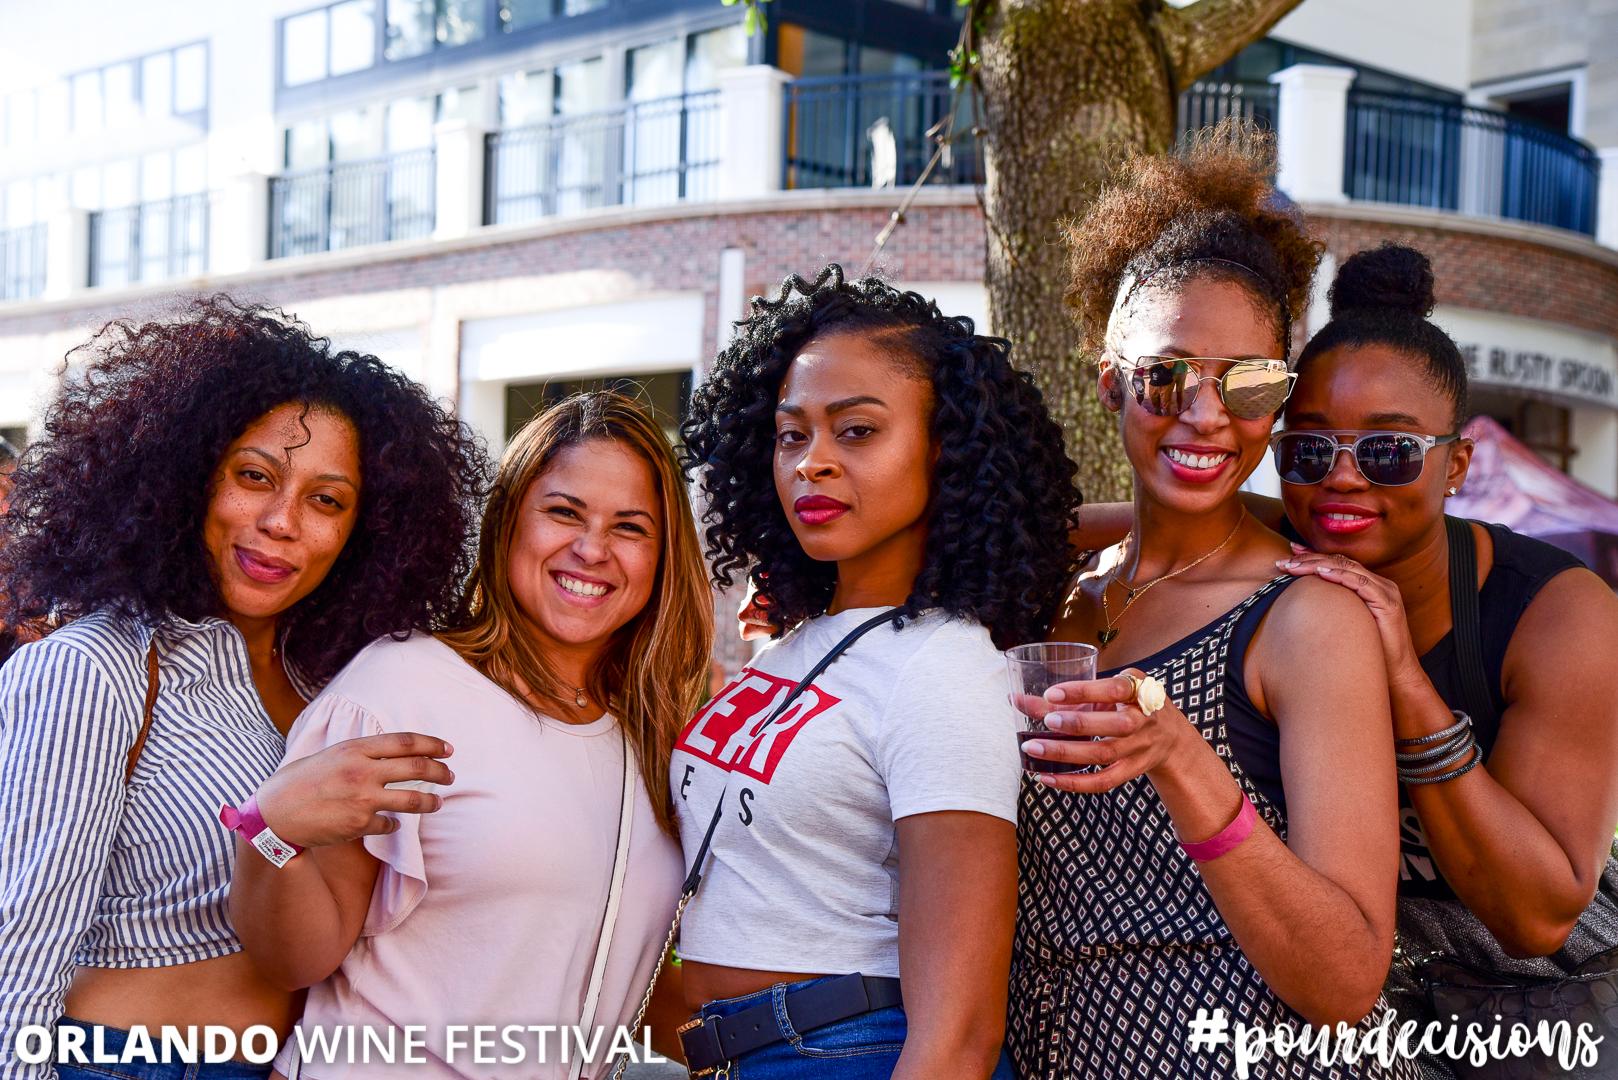 WineFest3-22-2018Watermarked (108 of 141)